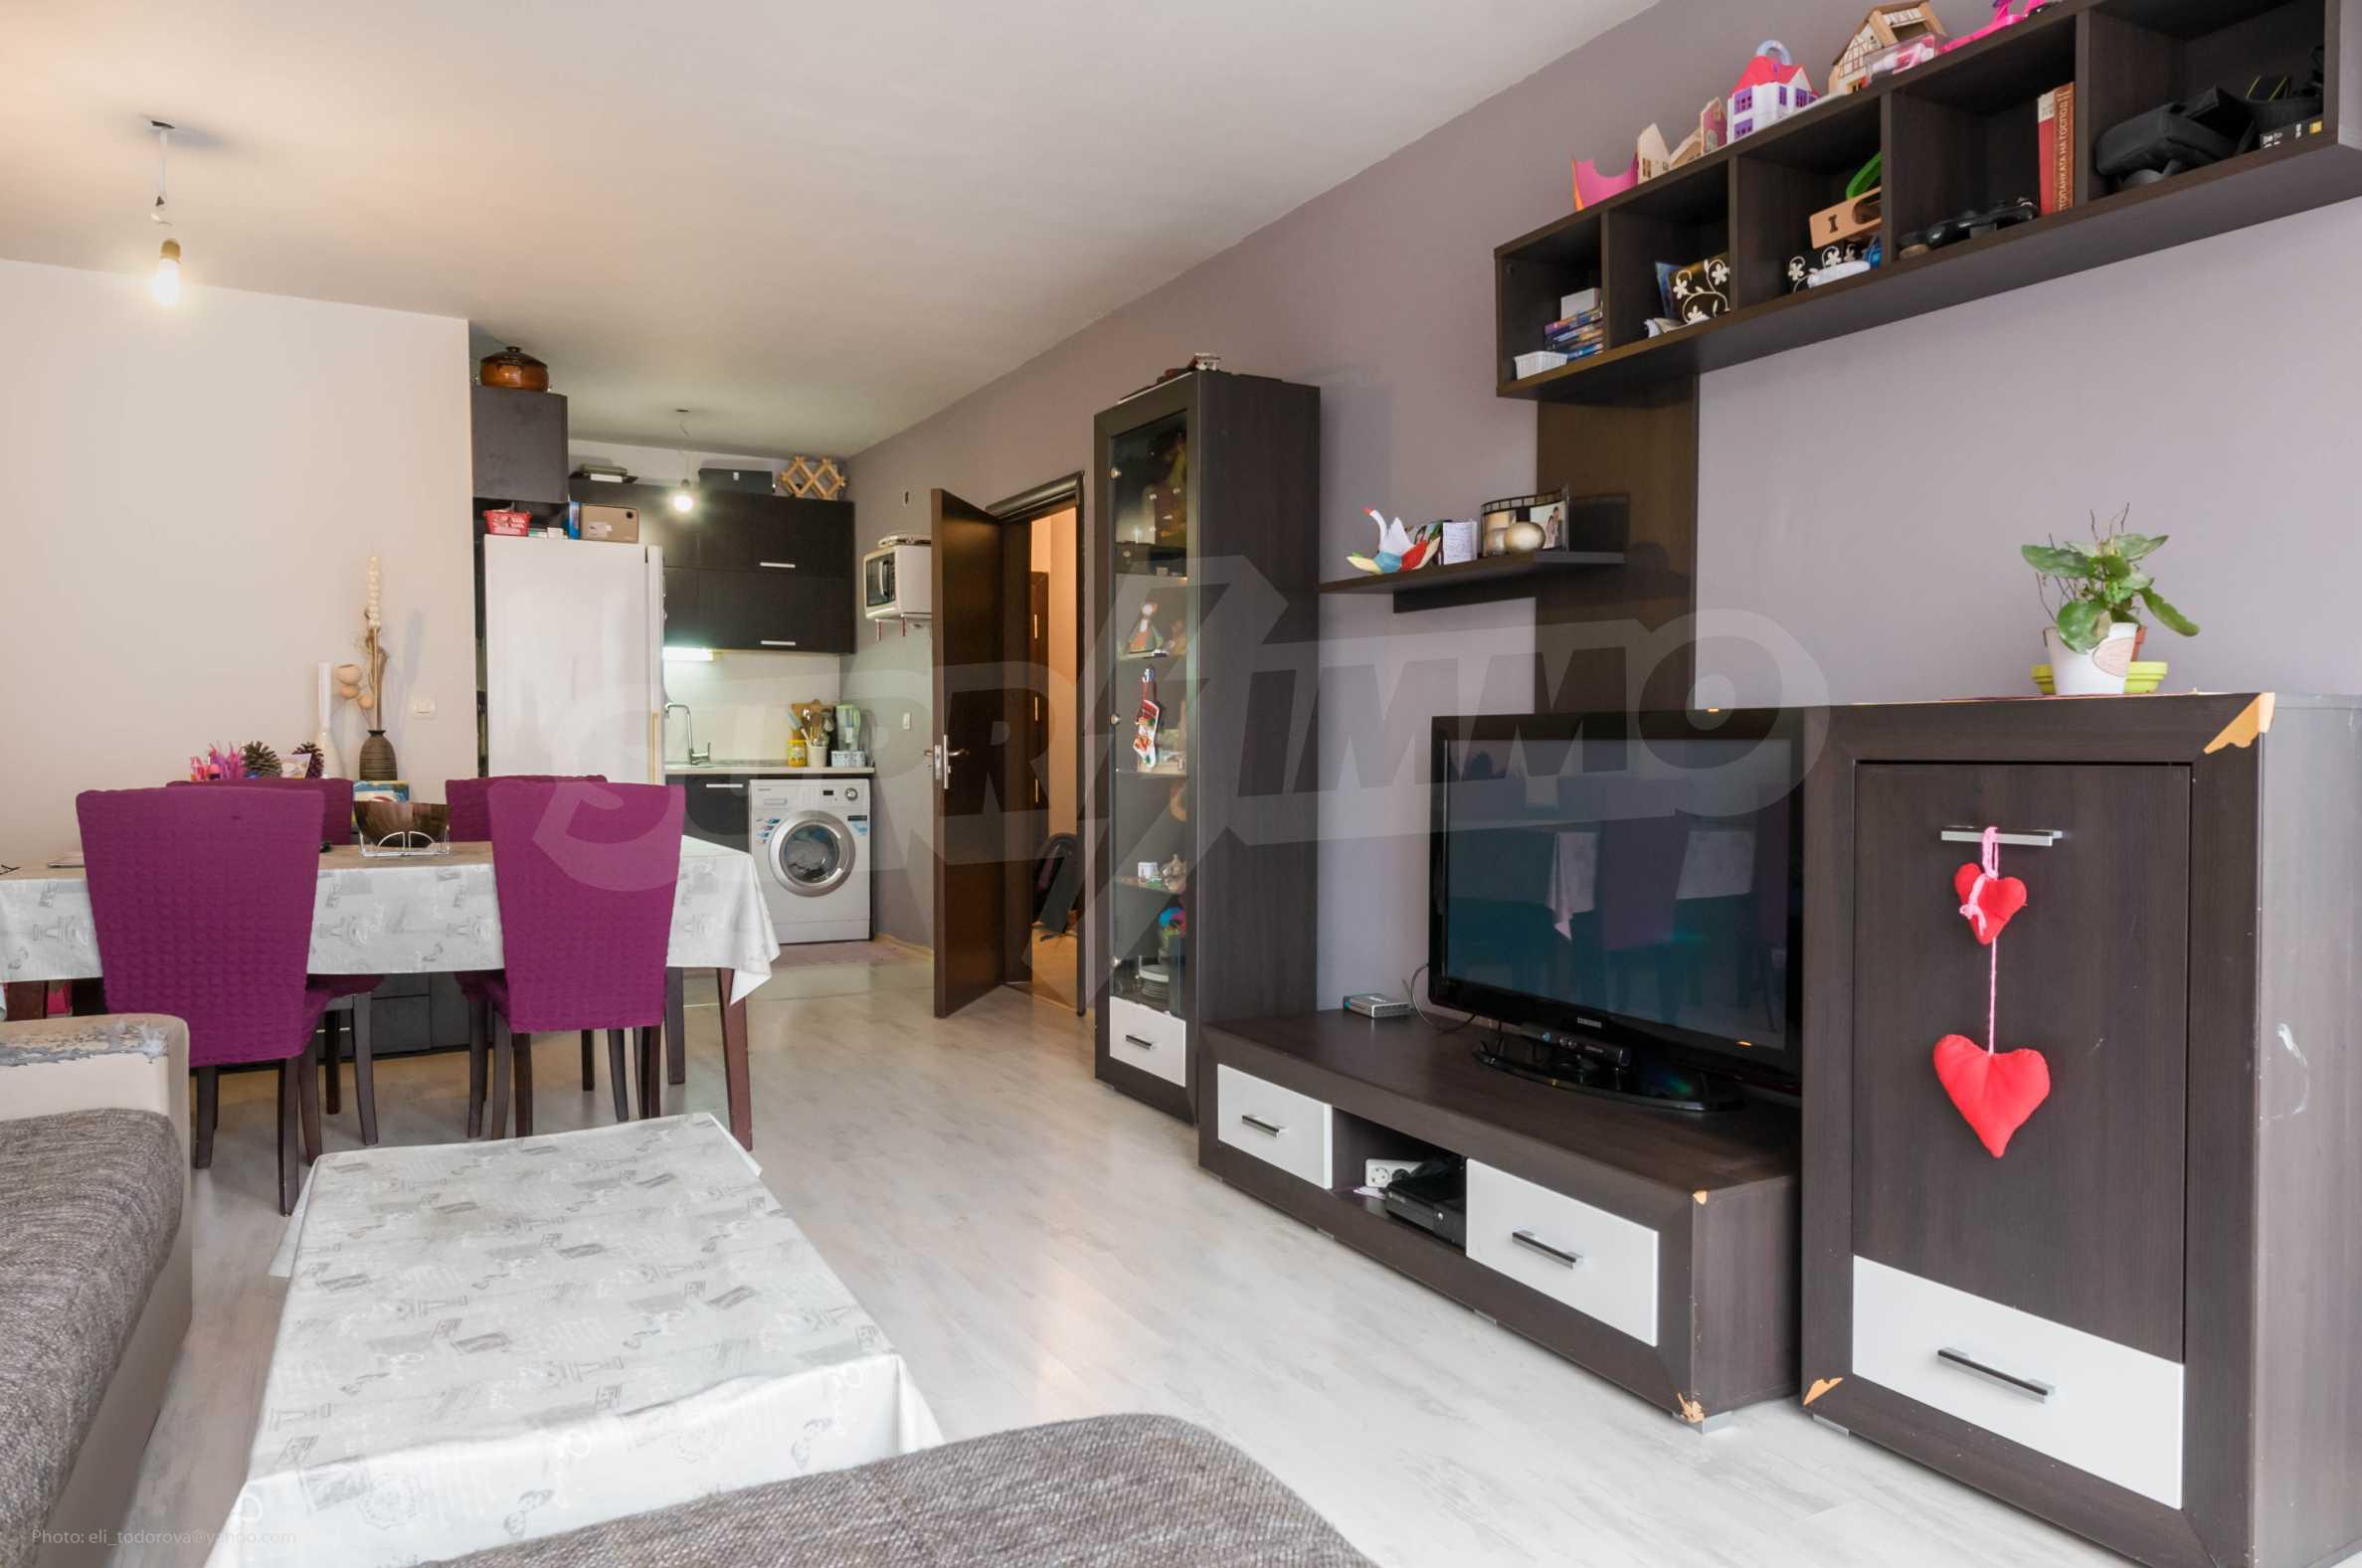 1-bedroom apartment for sale in Varna, Bulgaria - Sales - 1-bedroom apartment.